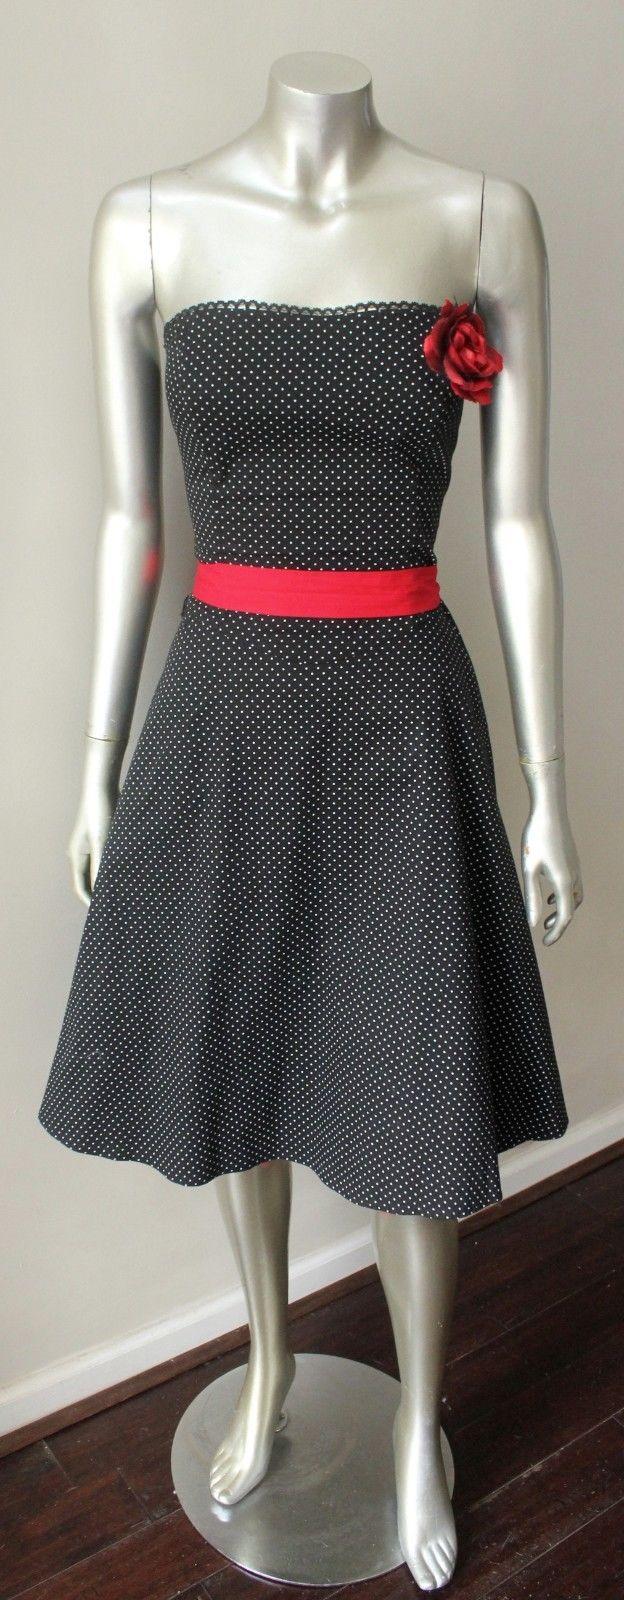 Pin Up Polka Dot Vintage Corsage Belted Strapless Black White A Line Dress S